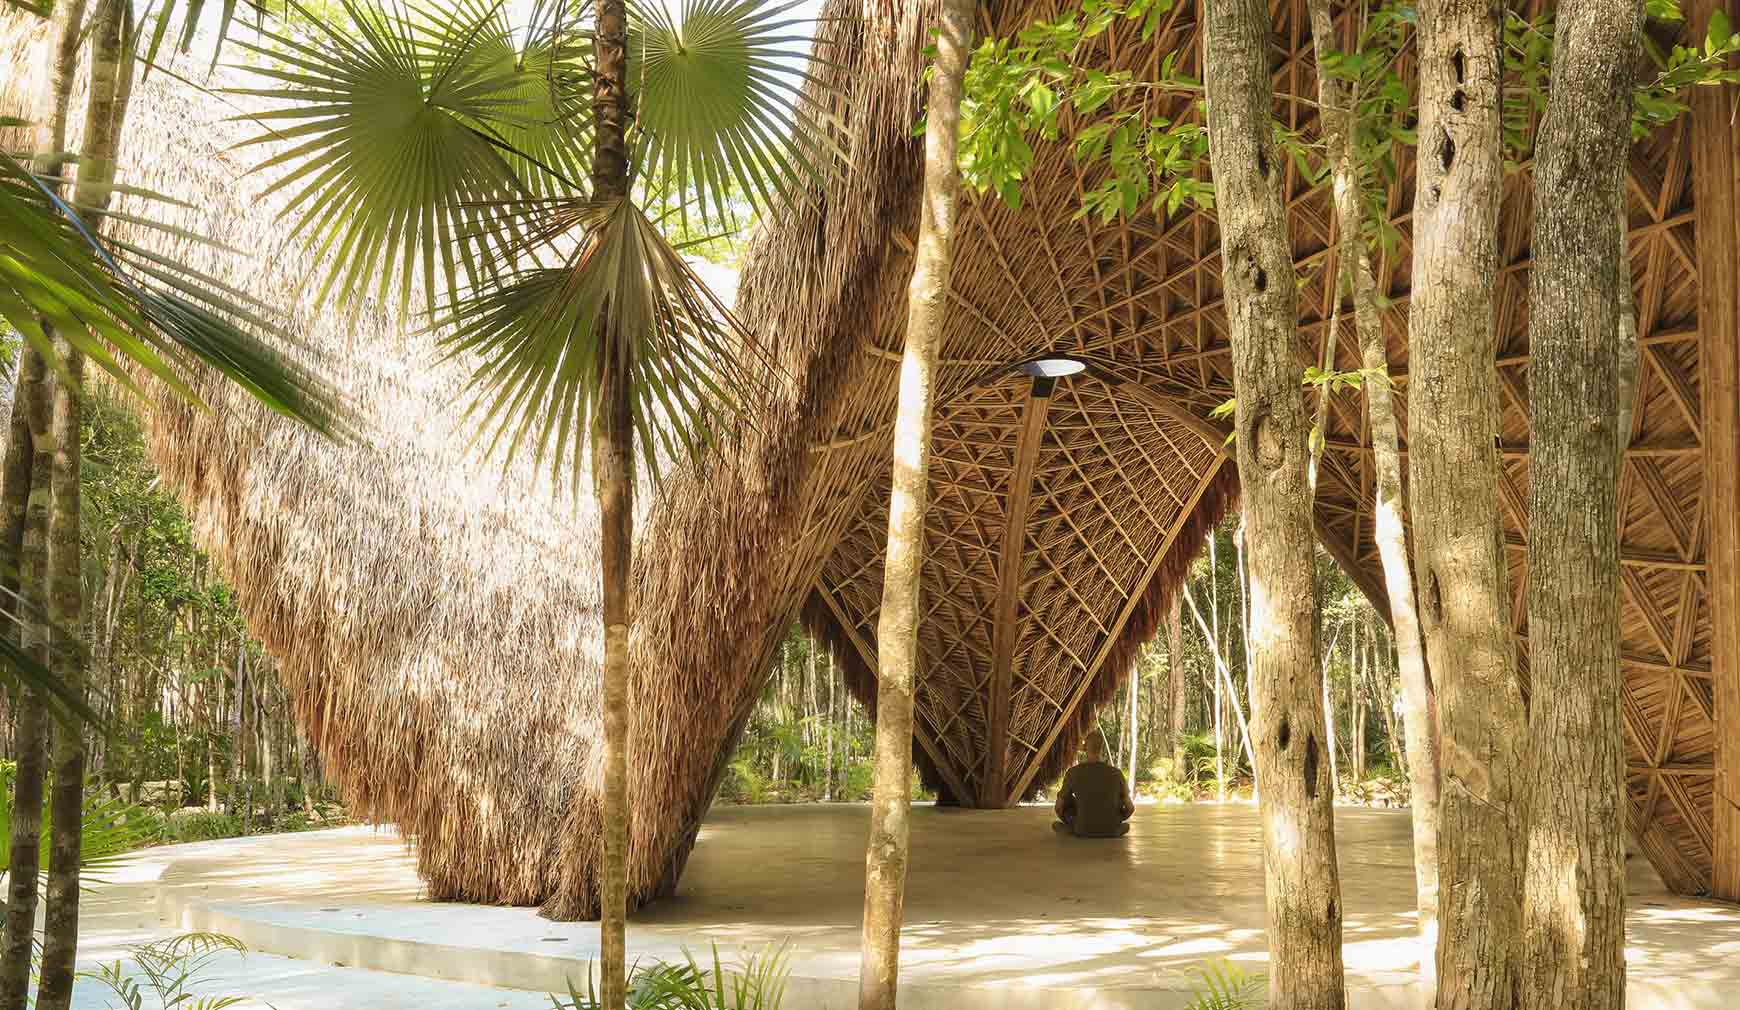 These yoga studios set a new standard for calming design: Luum Temple in Tulum, Mexico